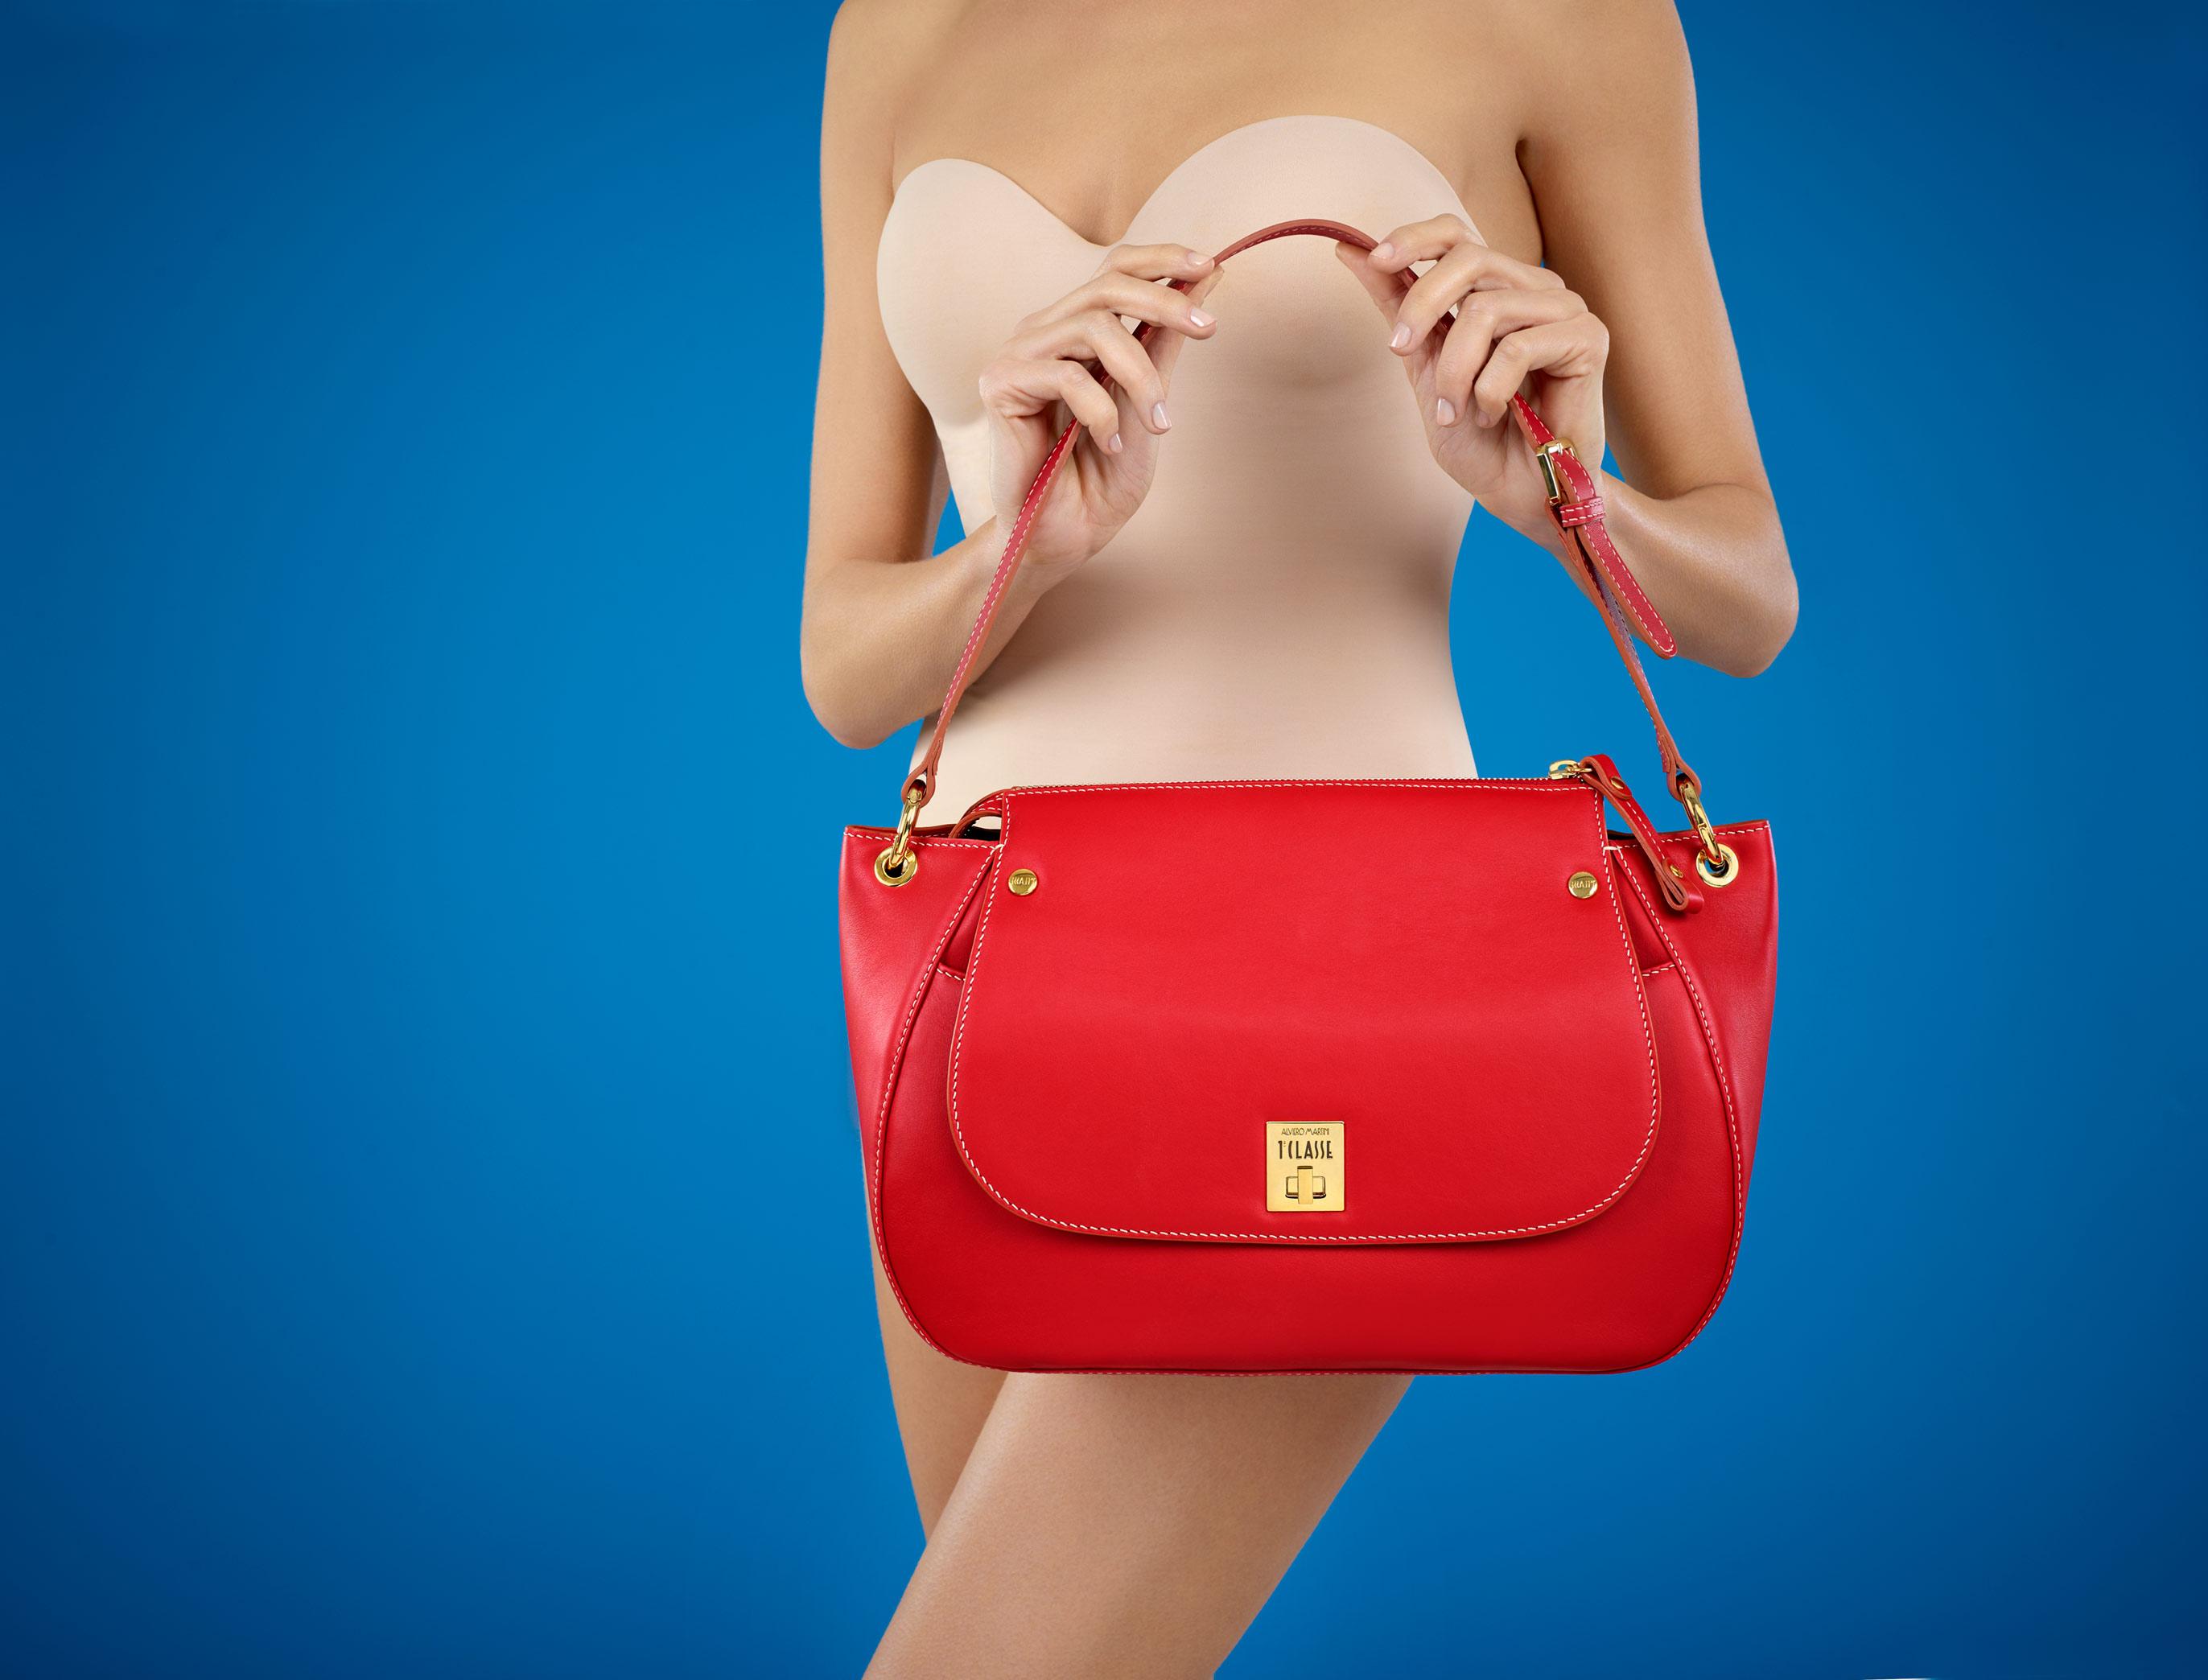 1classe-GabrieleFogliphotography-fashioncampaing-fashionbags